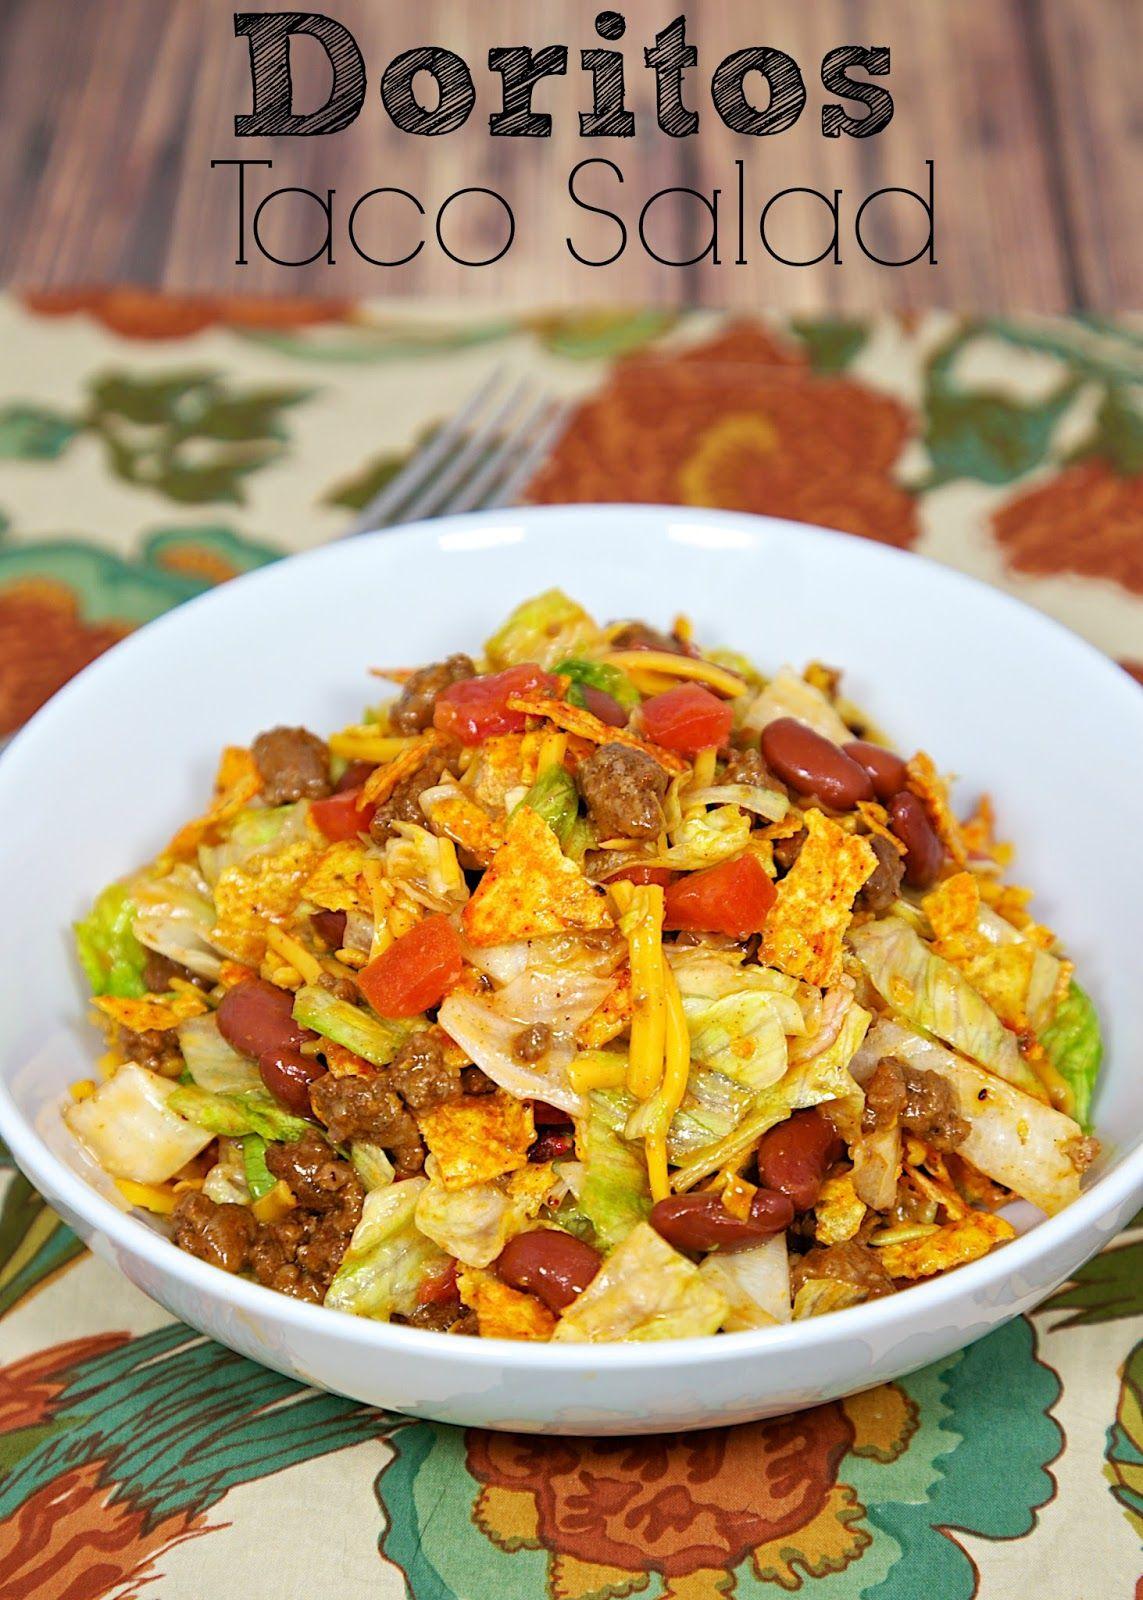 Doritos Taco Salad - Plain Chicken